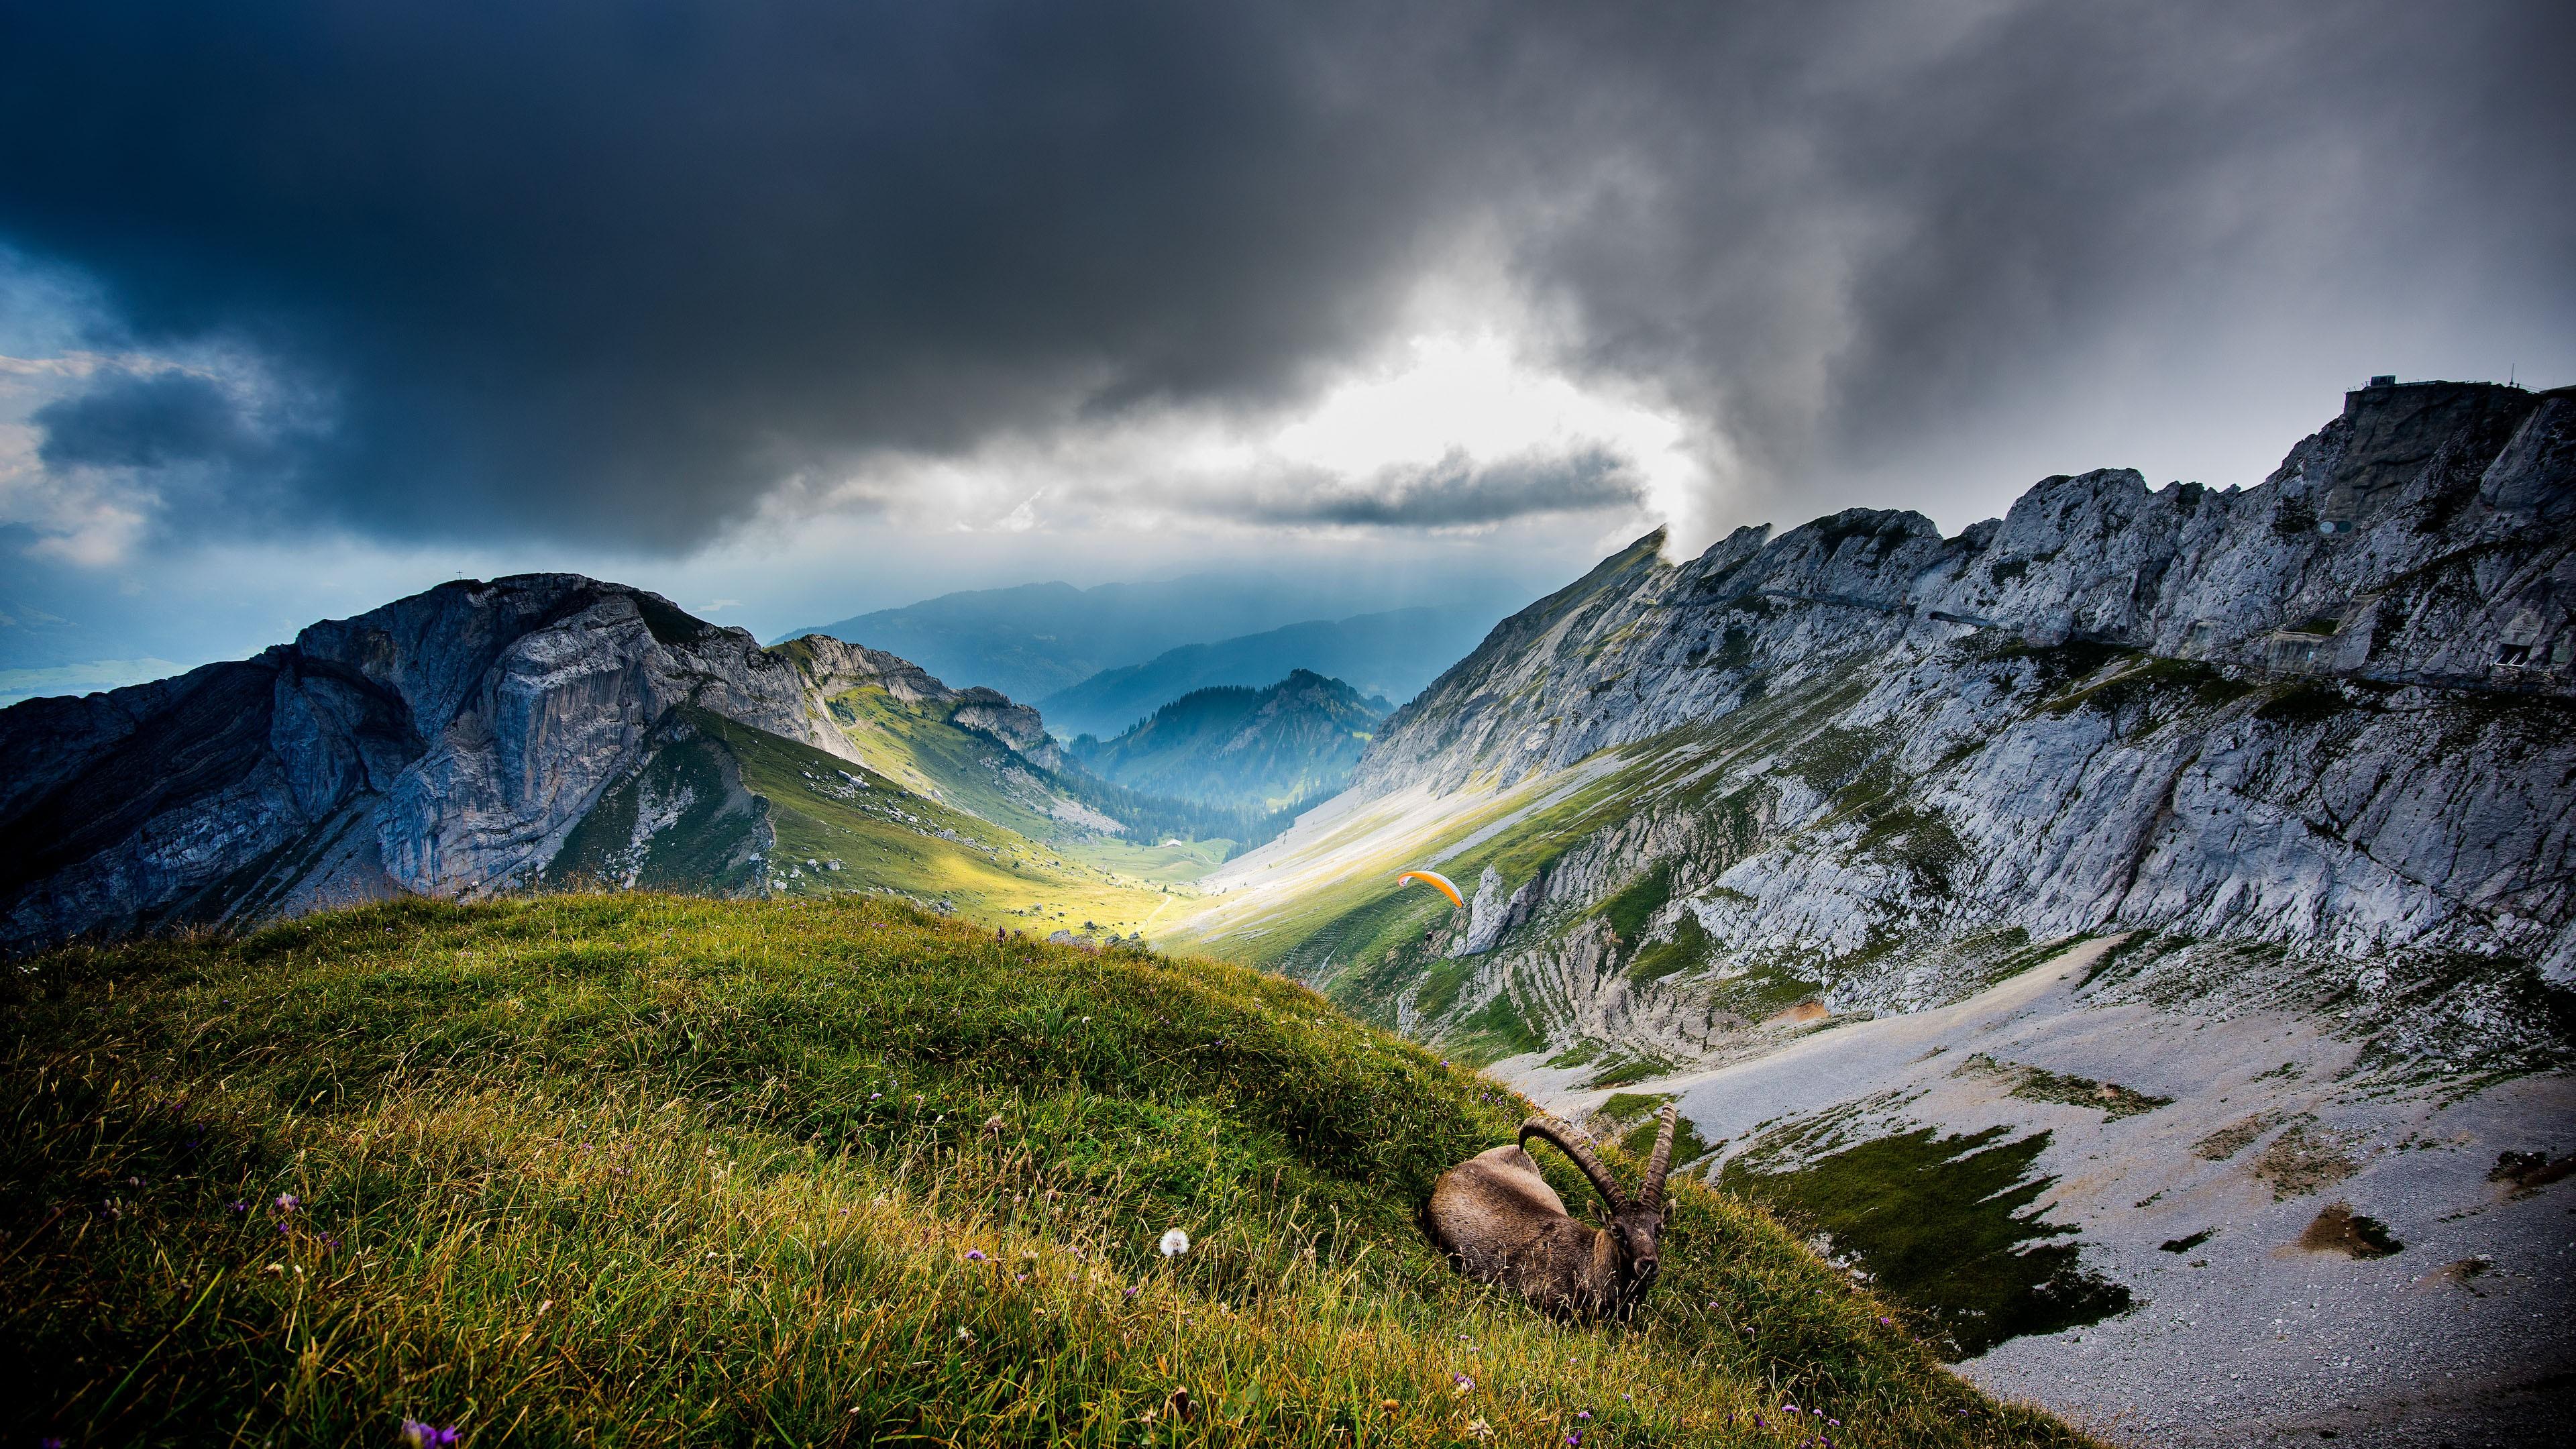 Wallpaper Mount Pilatus 5k 4k wallpaper Switzerland Mountains 3840x2160